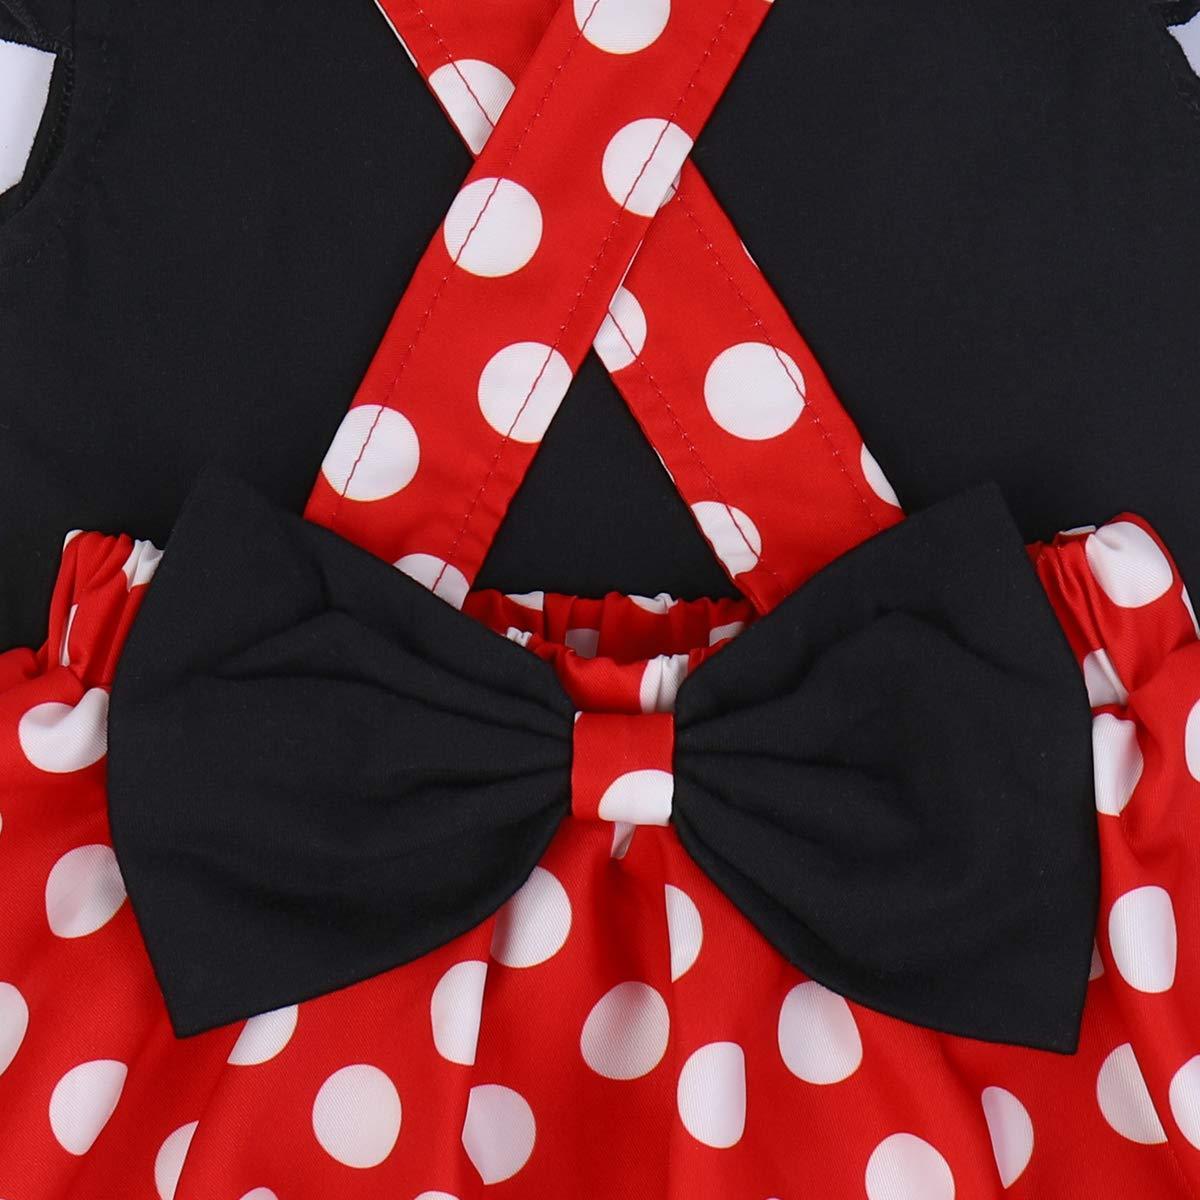 Minnie Costume Baby Girl Birthday Outfit Polka Dot Romper Braces Skirt 3pcs Set